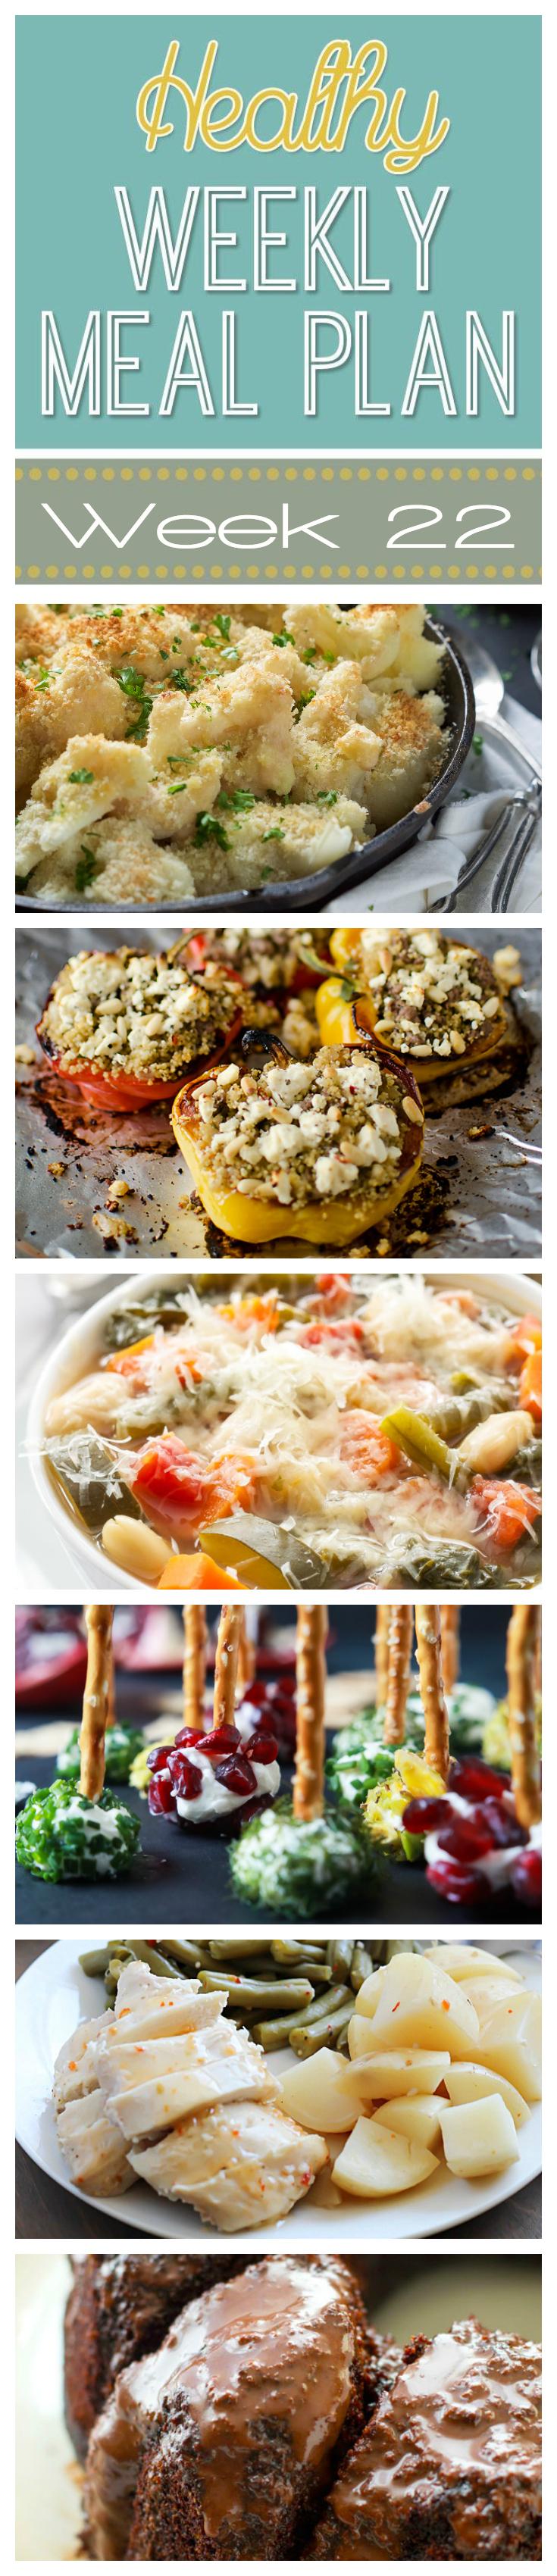 Healthy Weekly Meal Plan #22